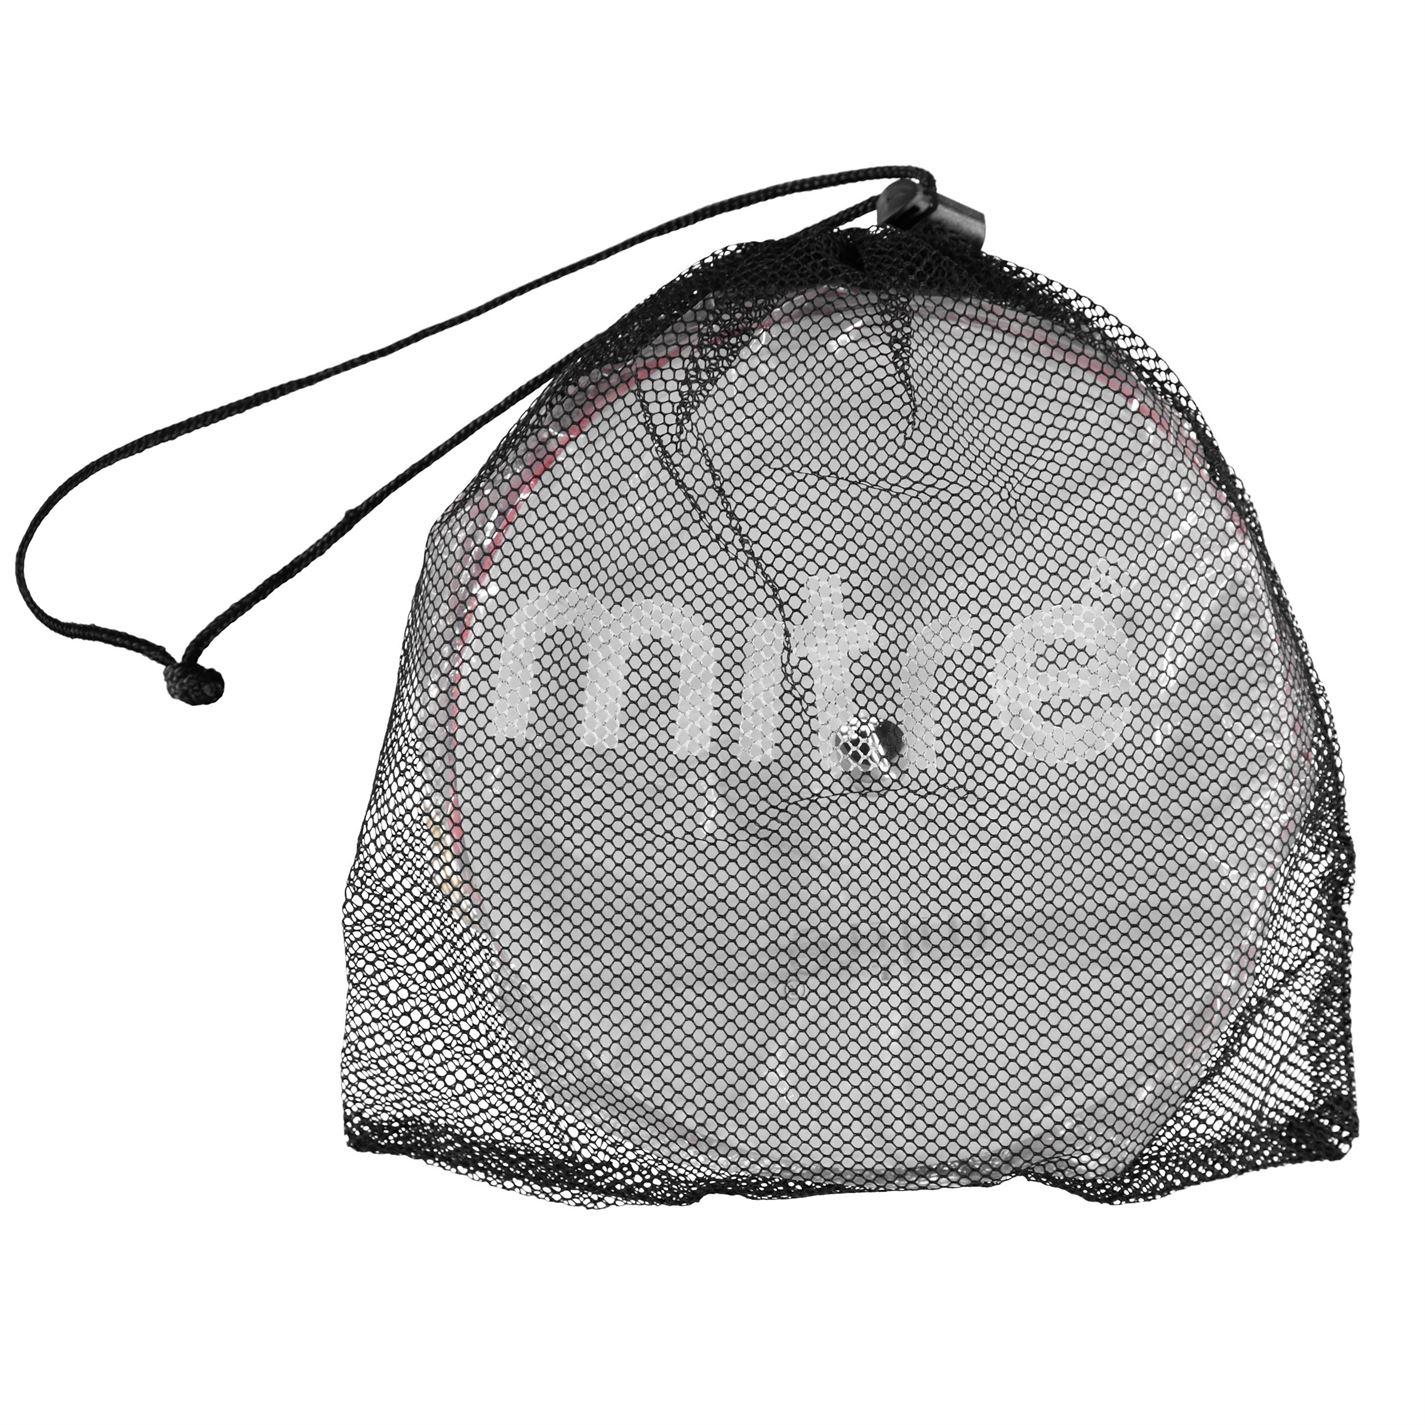 Mitre Flat Discs Training Accessory